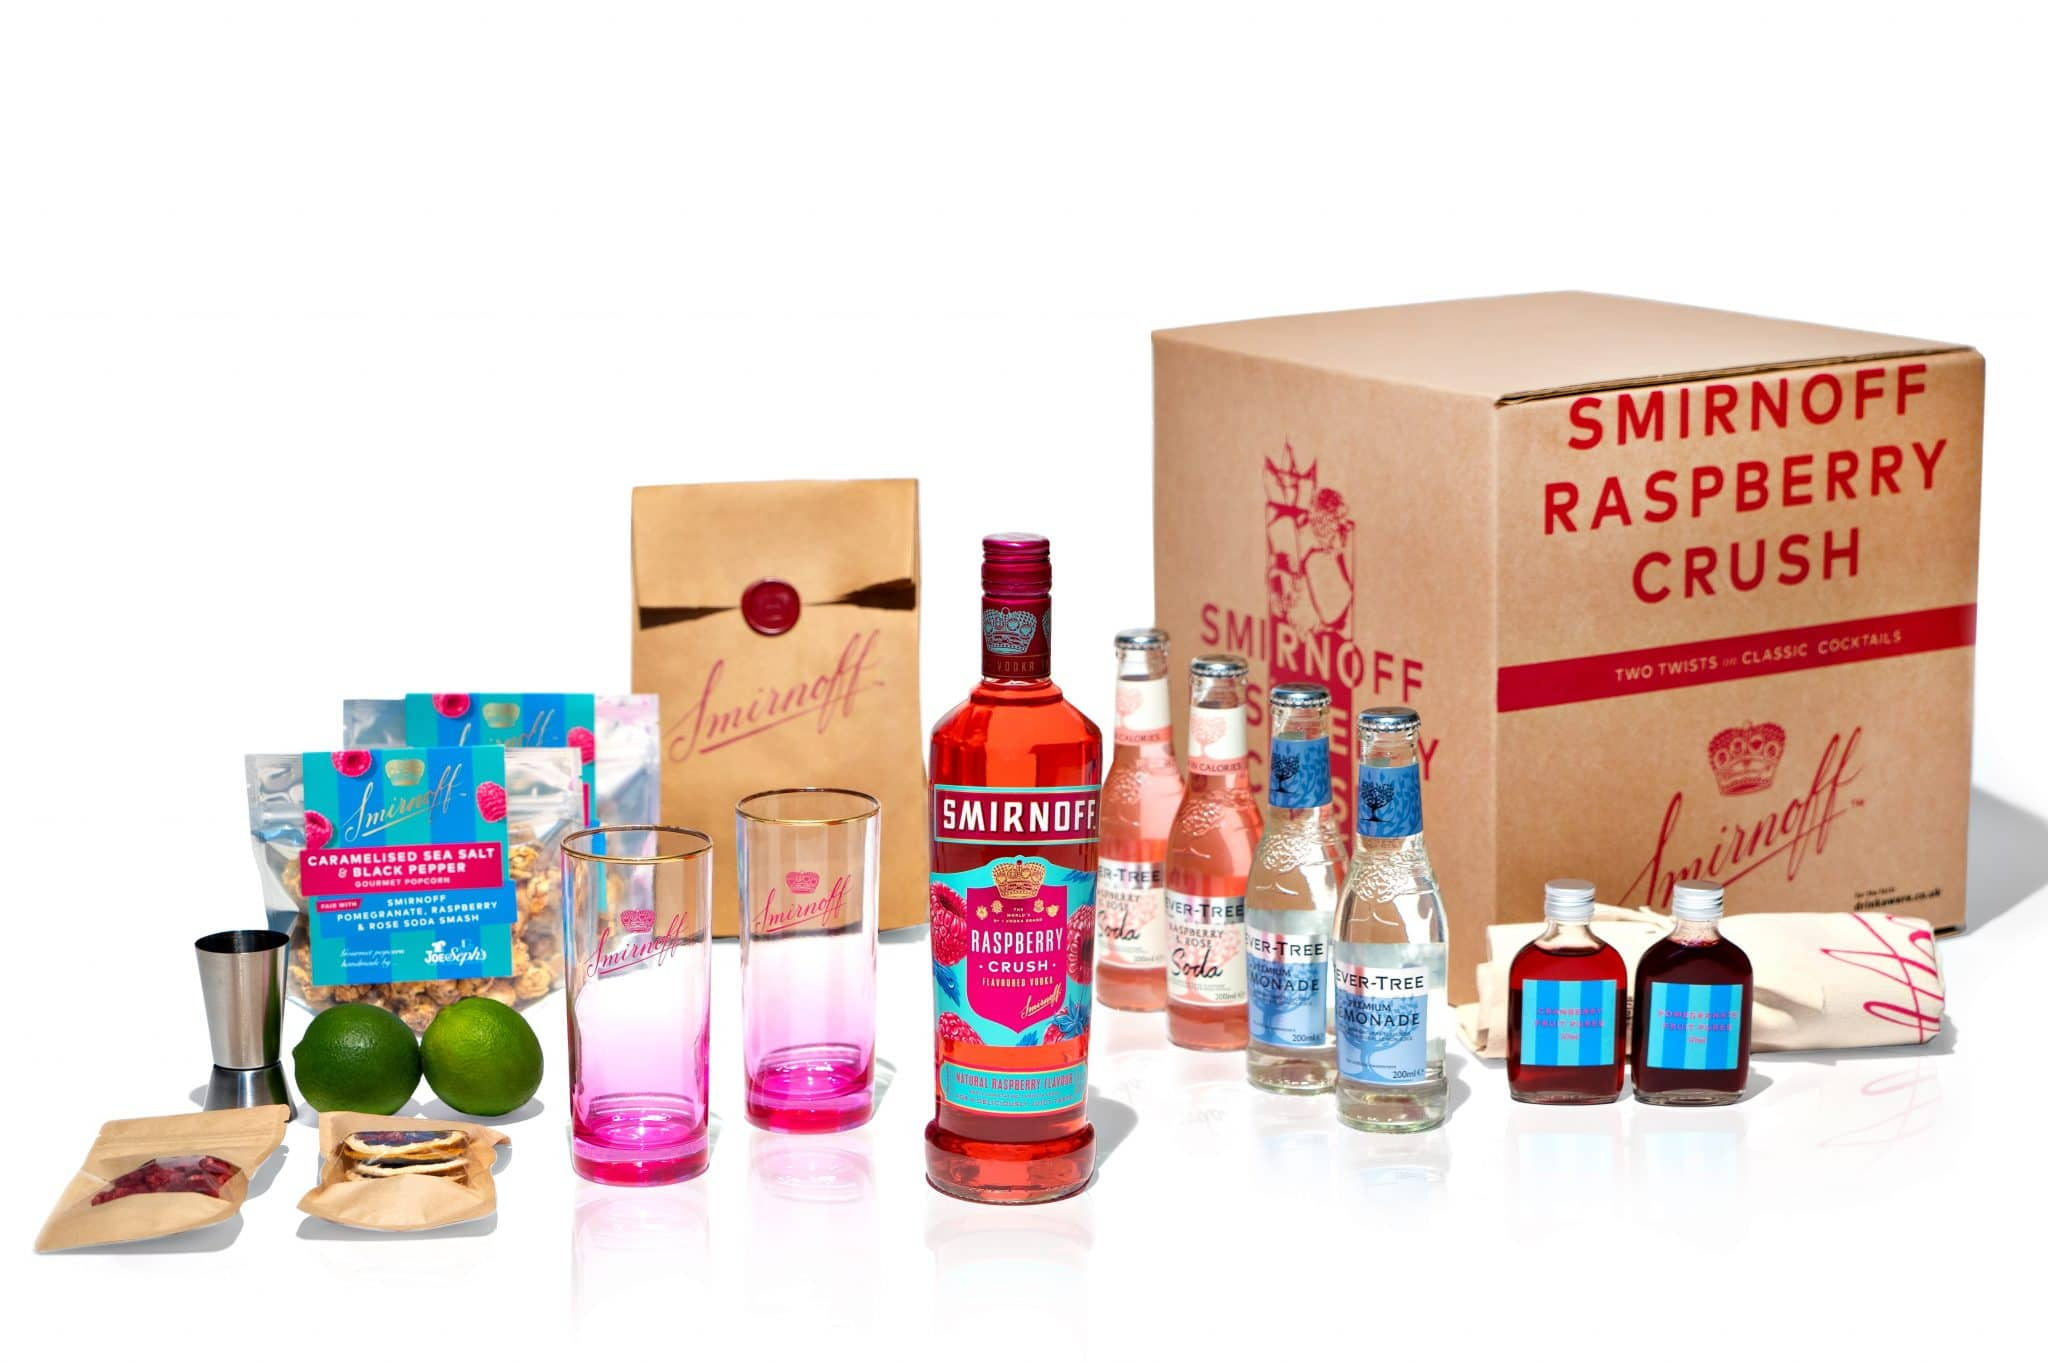 smirnoff raspberry crush cocktail kit